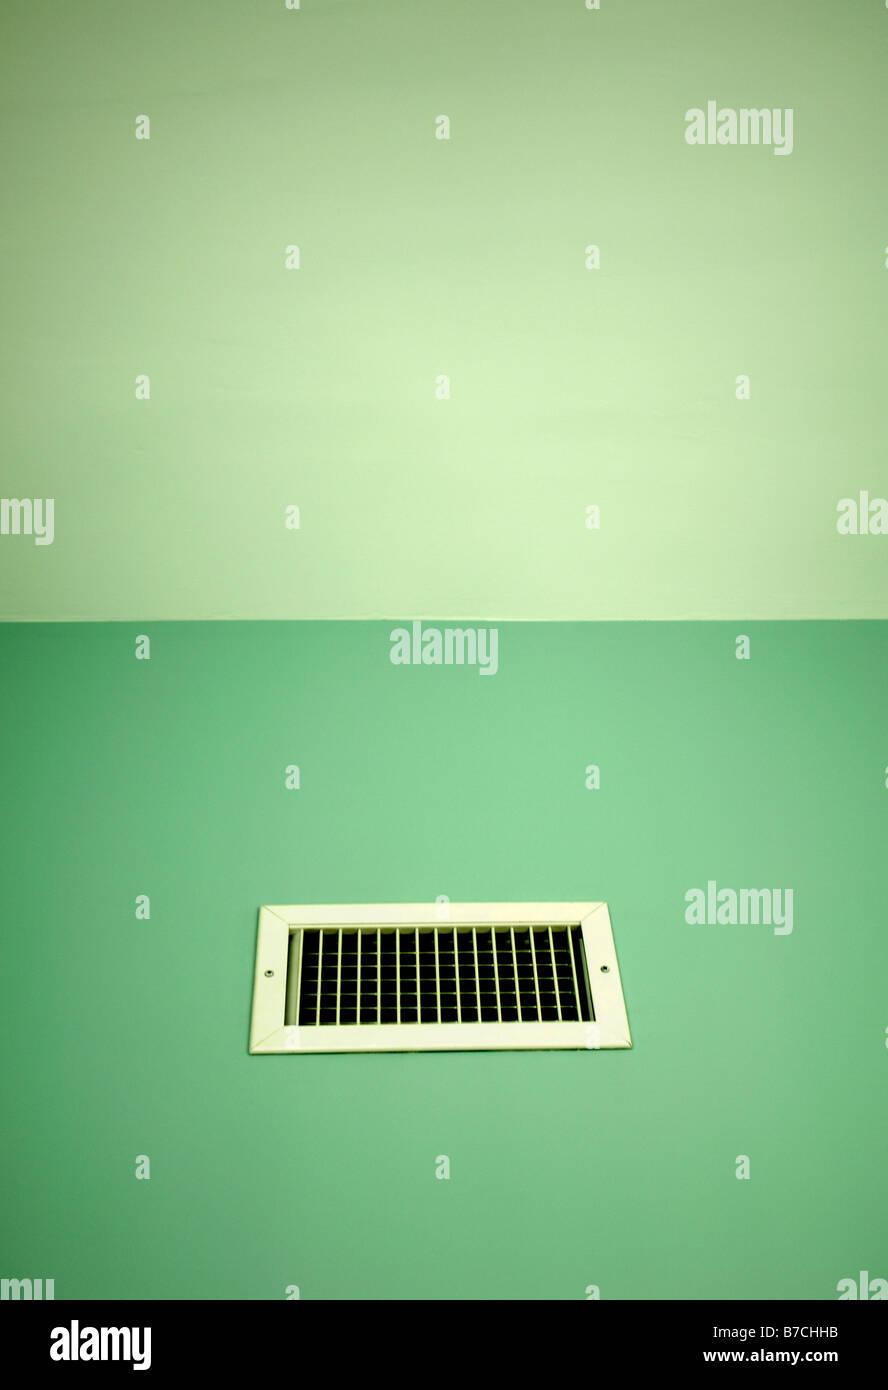 Aire de ventilación de apertura verde fresco viento casa respirar Imagen De Stock